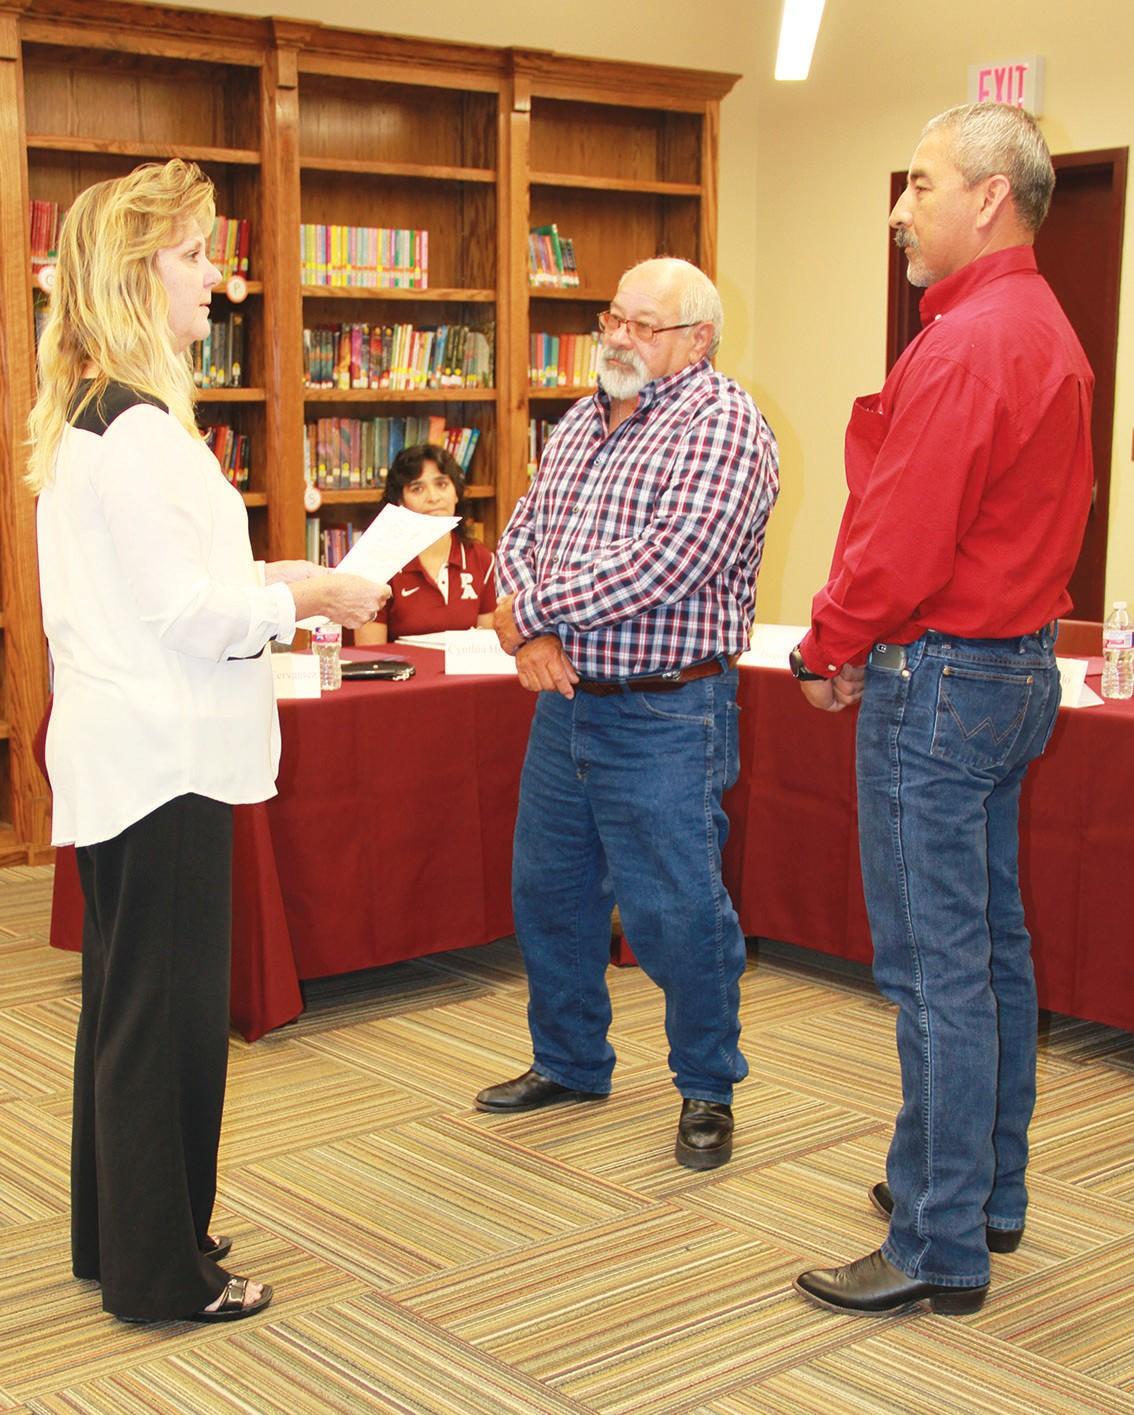 Suzanne Jenschke swears in returning school board member Louis Vasquez and new board member Diego Puente at the May 16 Poteet ISD School Board meeting.